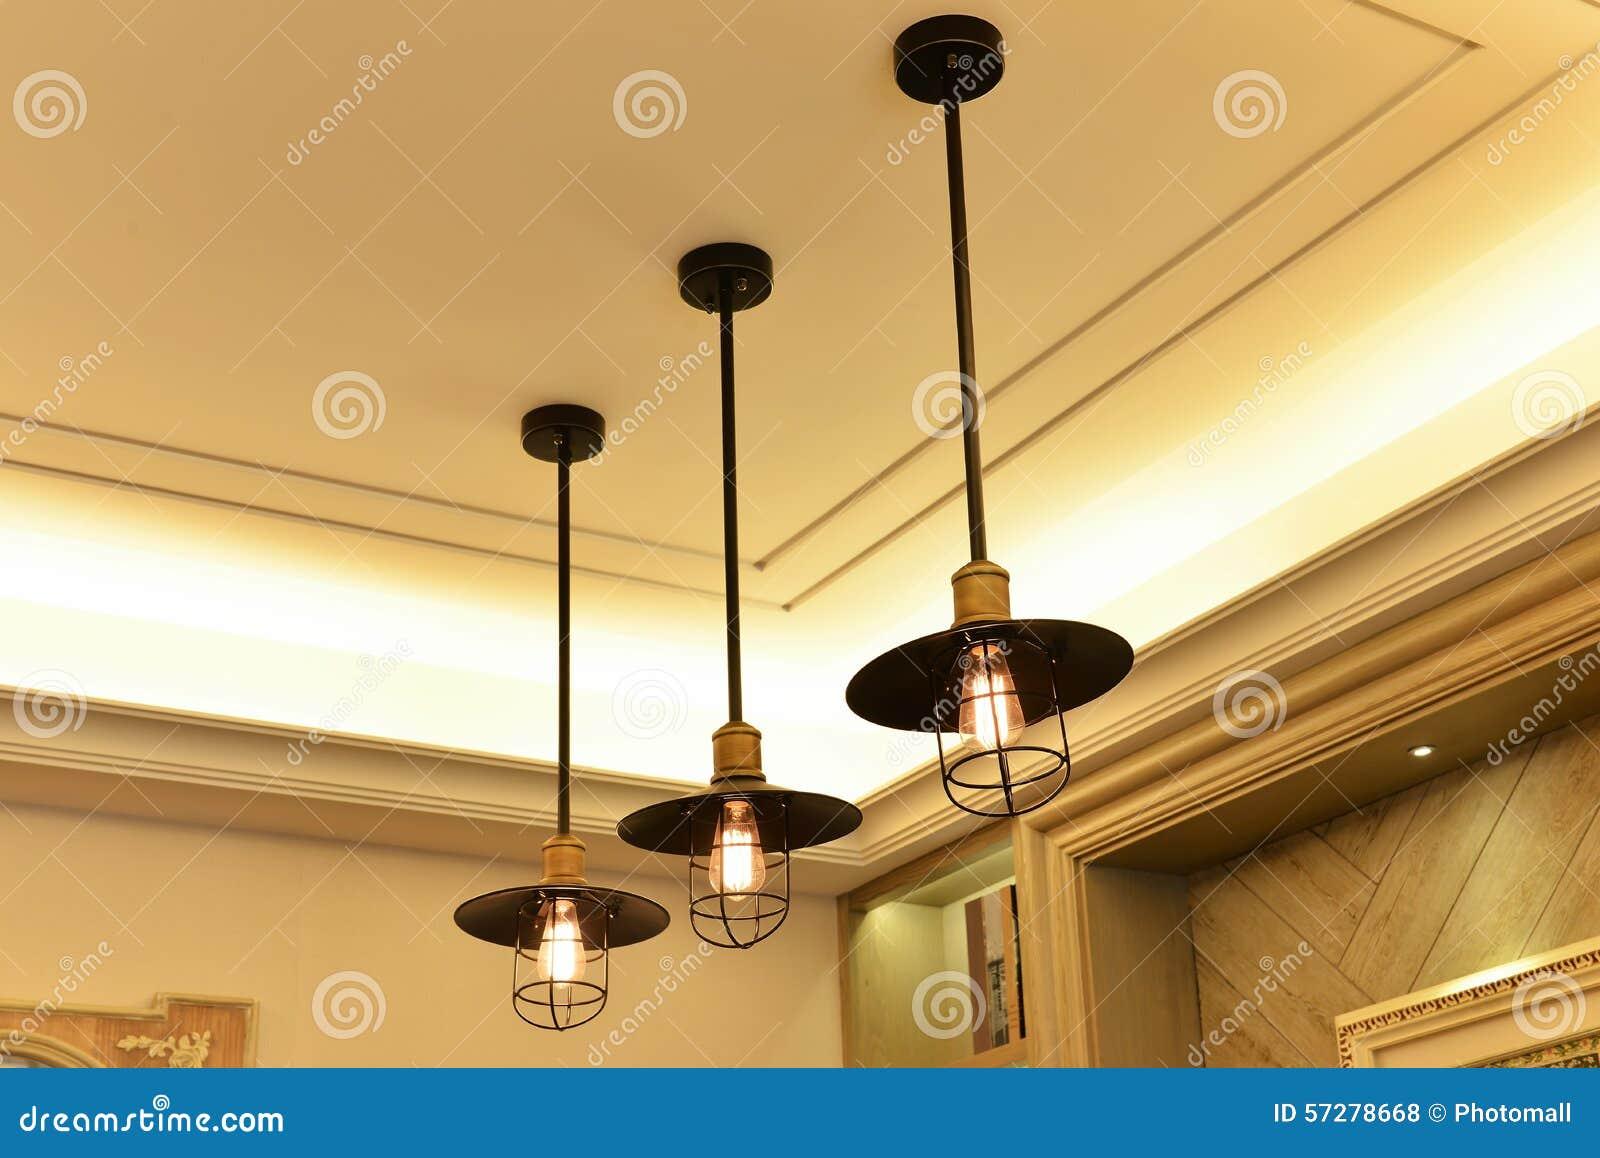 Classic Ceiling Light Stock Photo